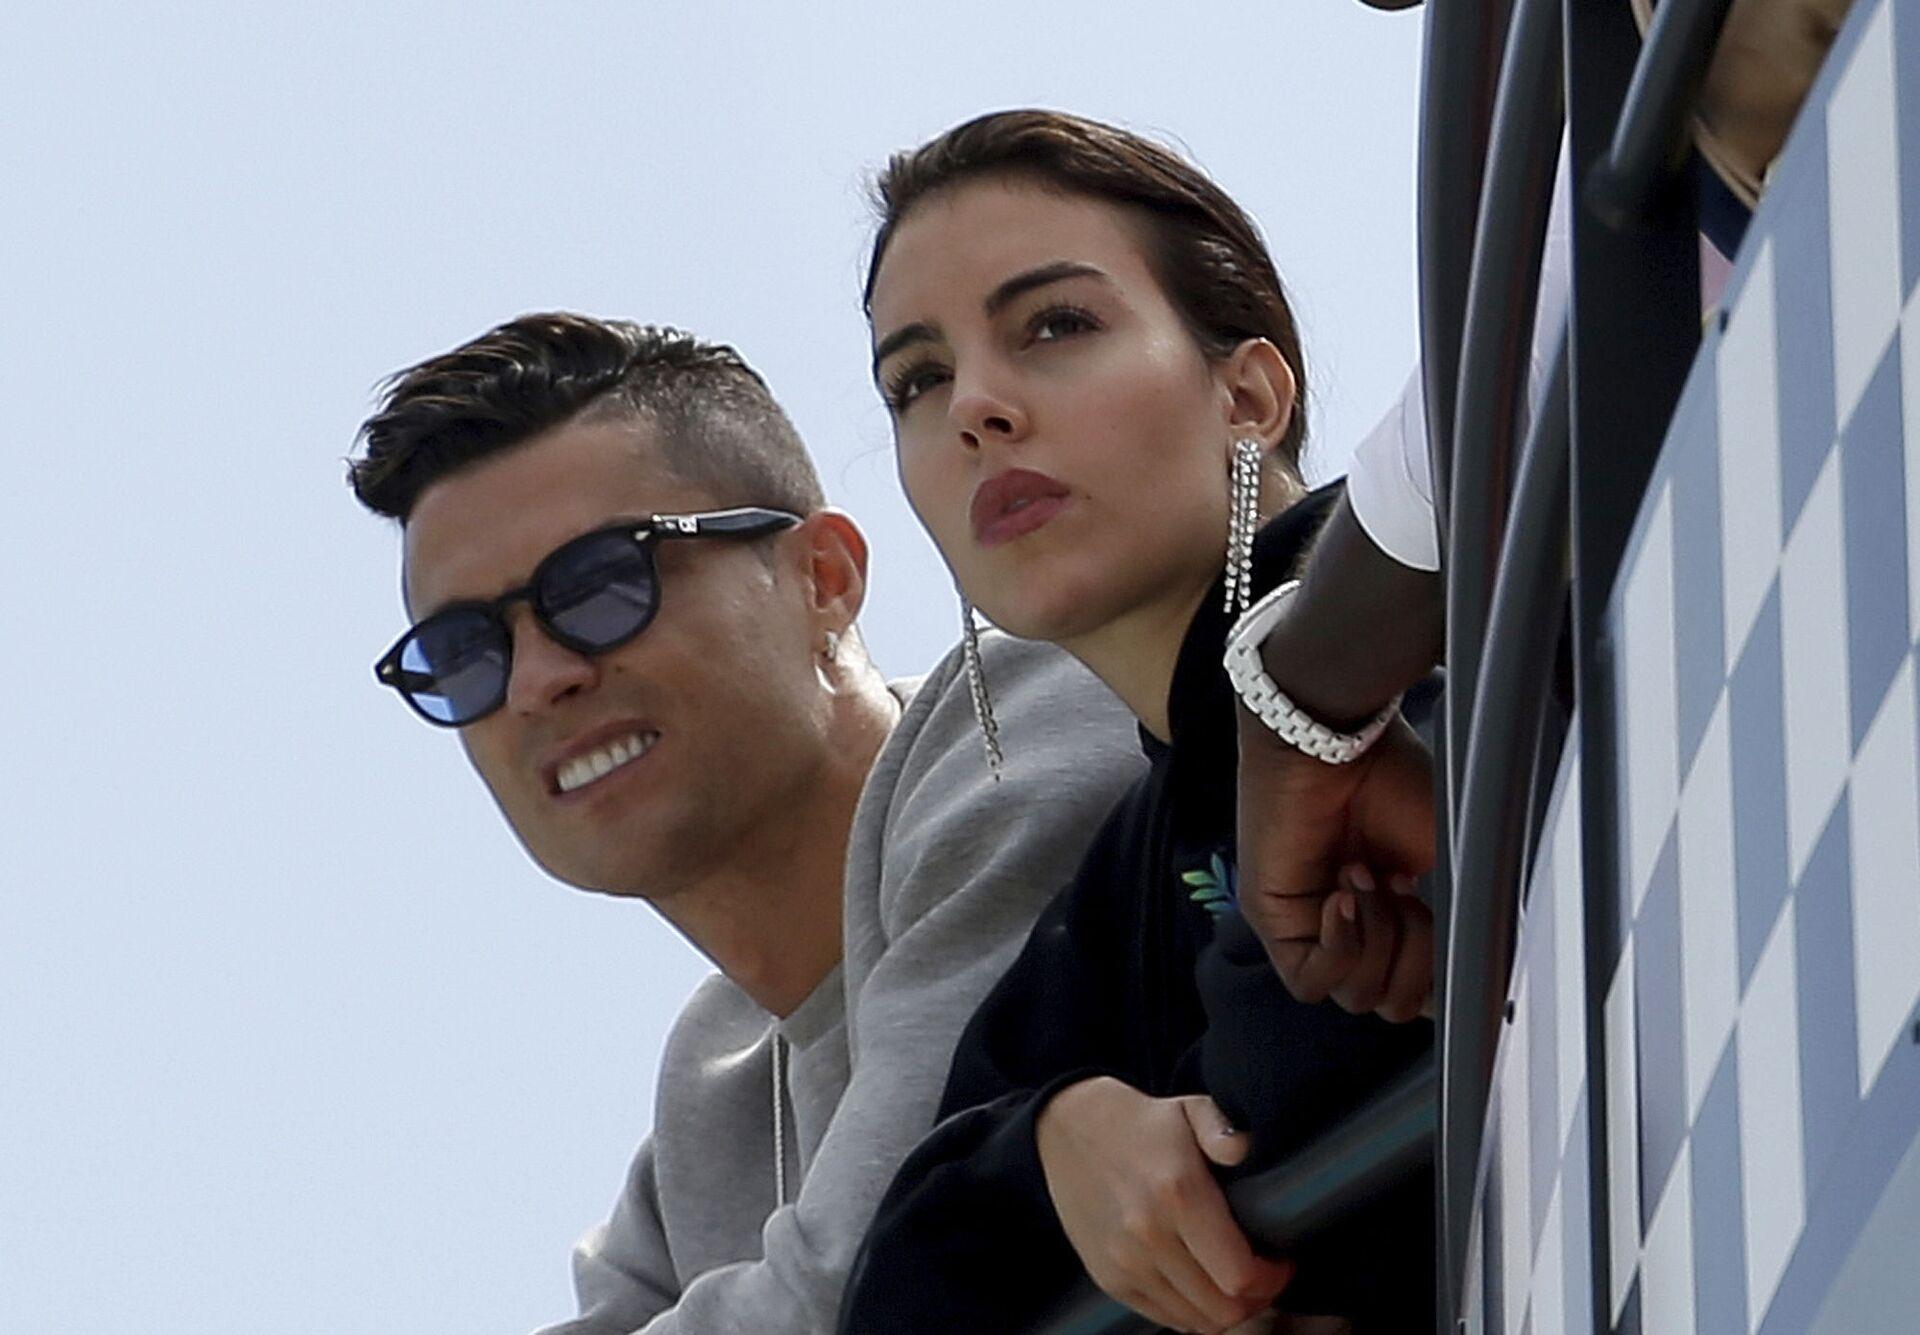 Cristiano Ronaldo Rape Accuser Reportedly Seeks $78 Mln for 'Pain & Suffering' Over 2009 Incident - Sputnik International, 1920, 29.04.2021